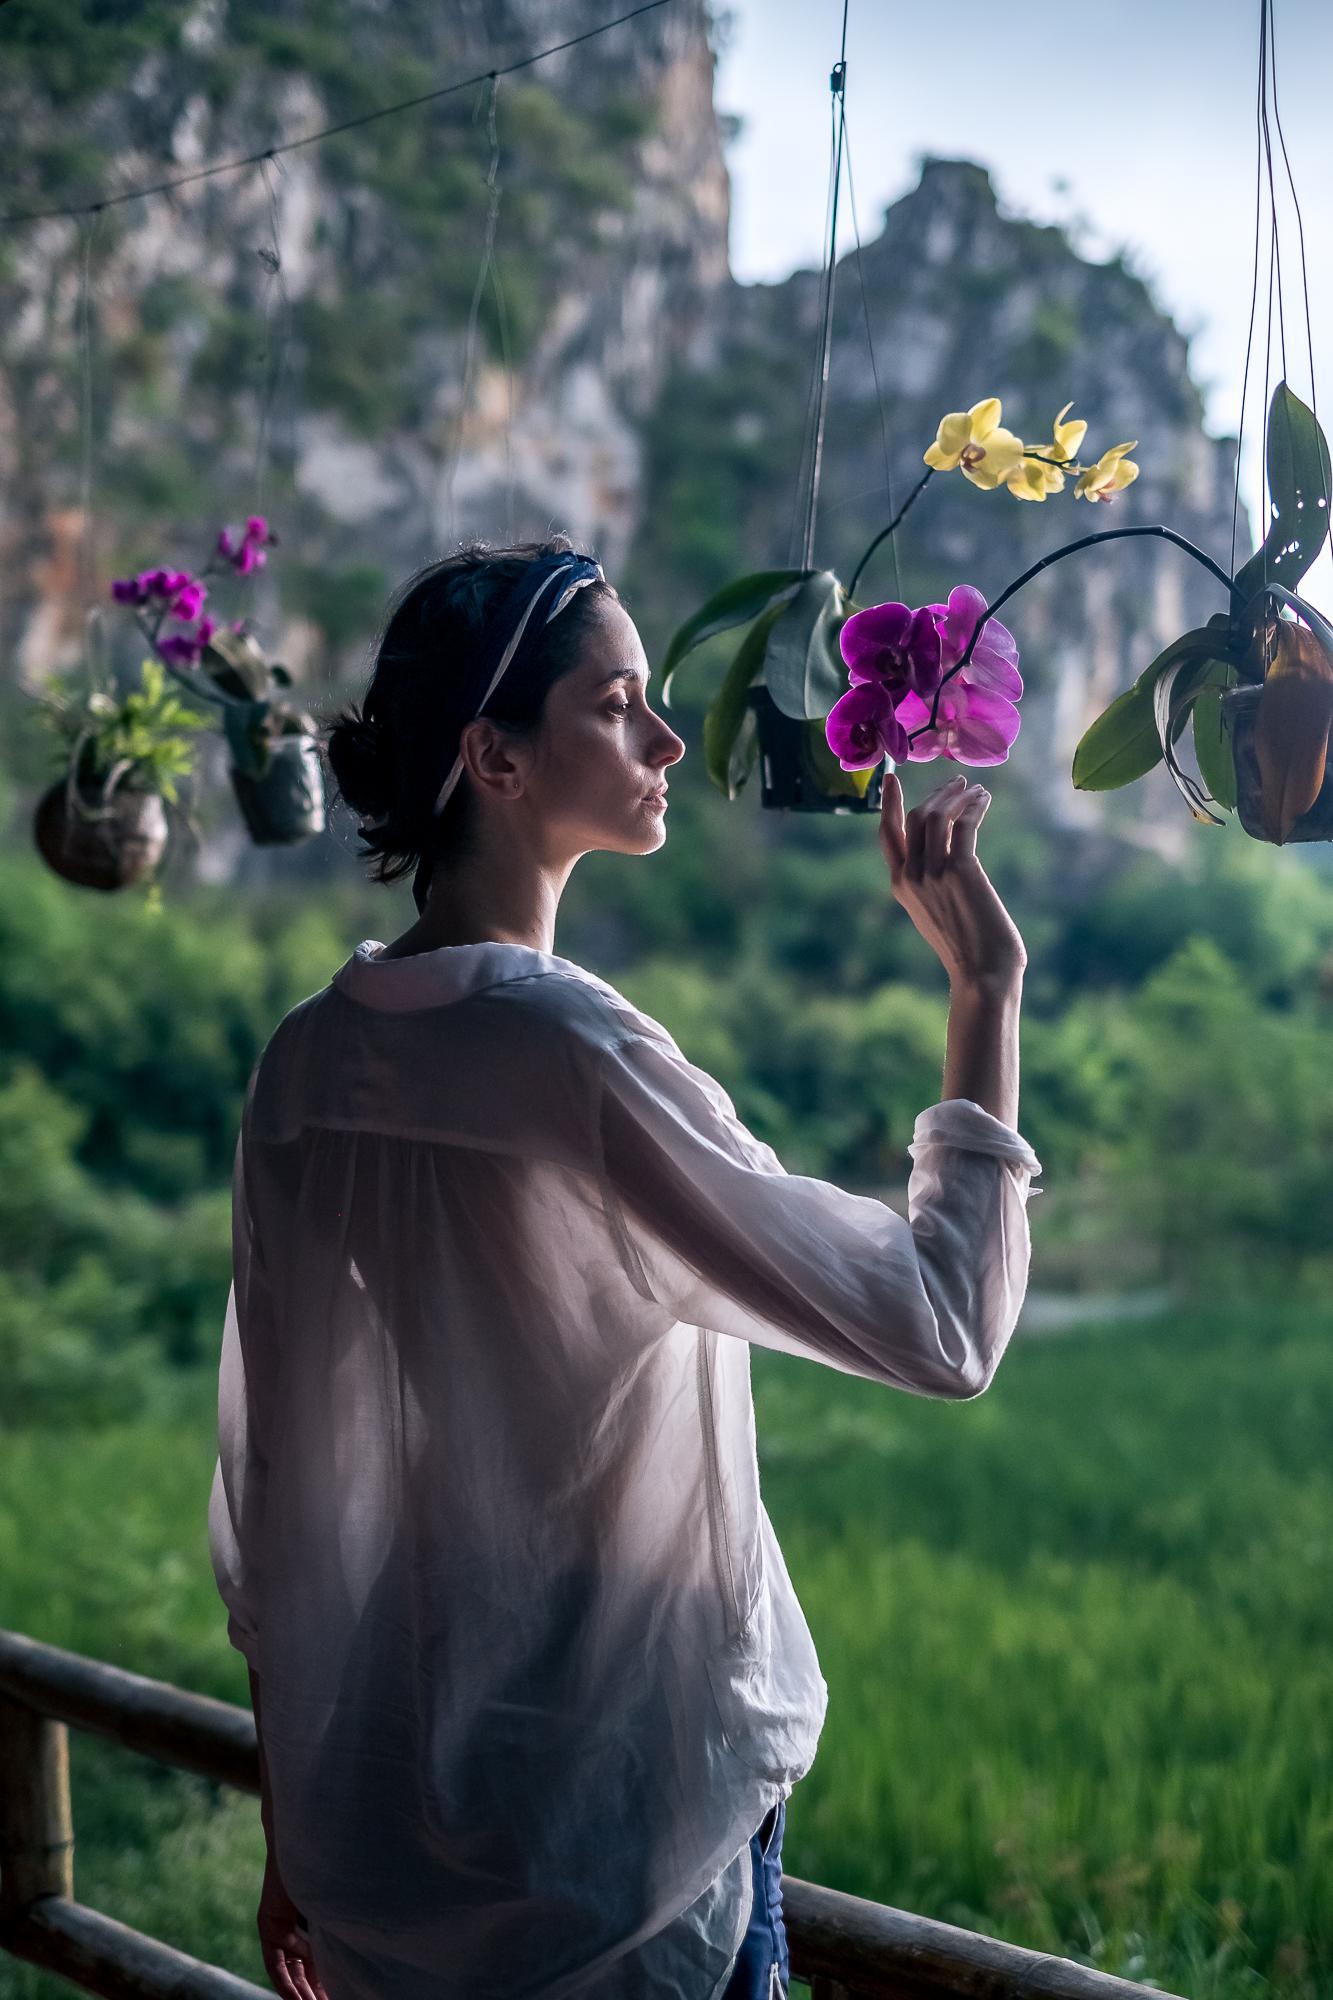 Vietnam_Honeymoon_TheOutsiderBlog_DSCF8782.JPG